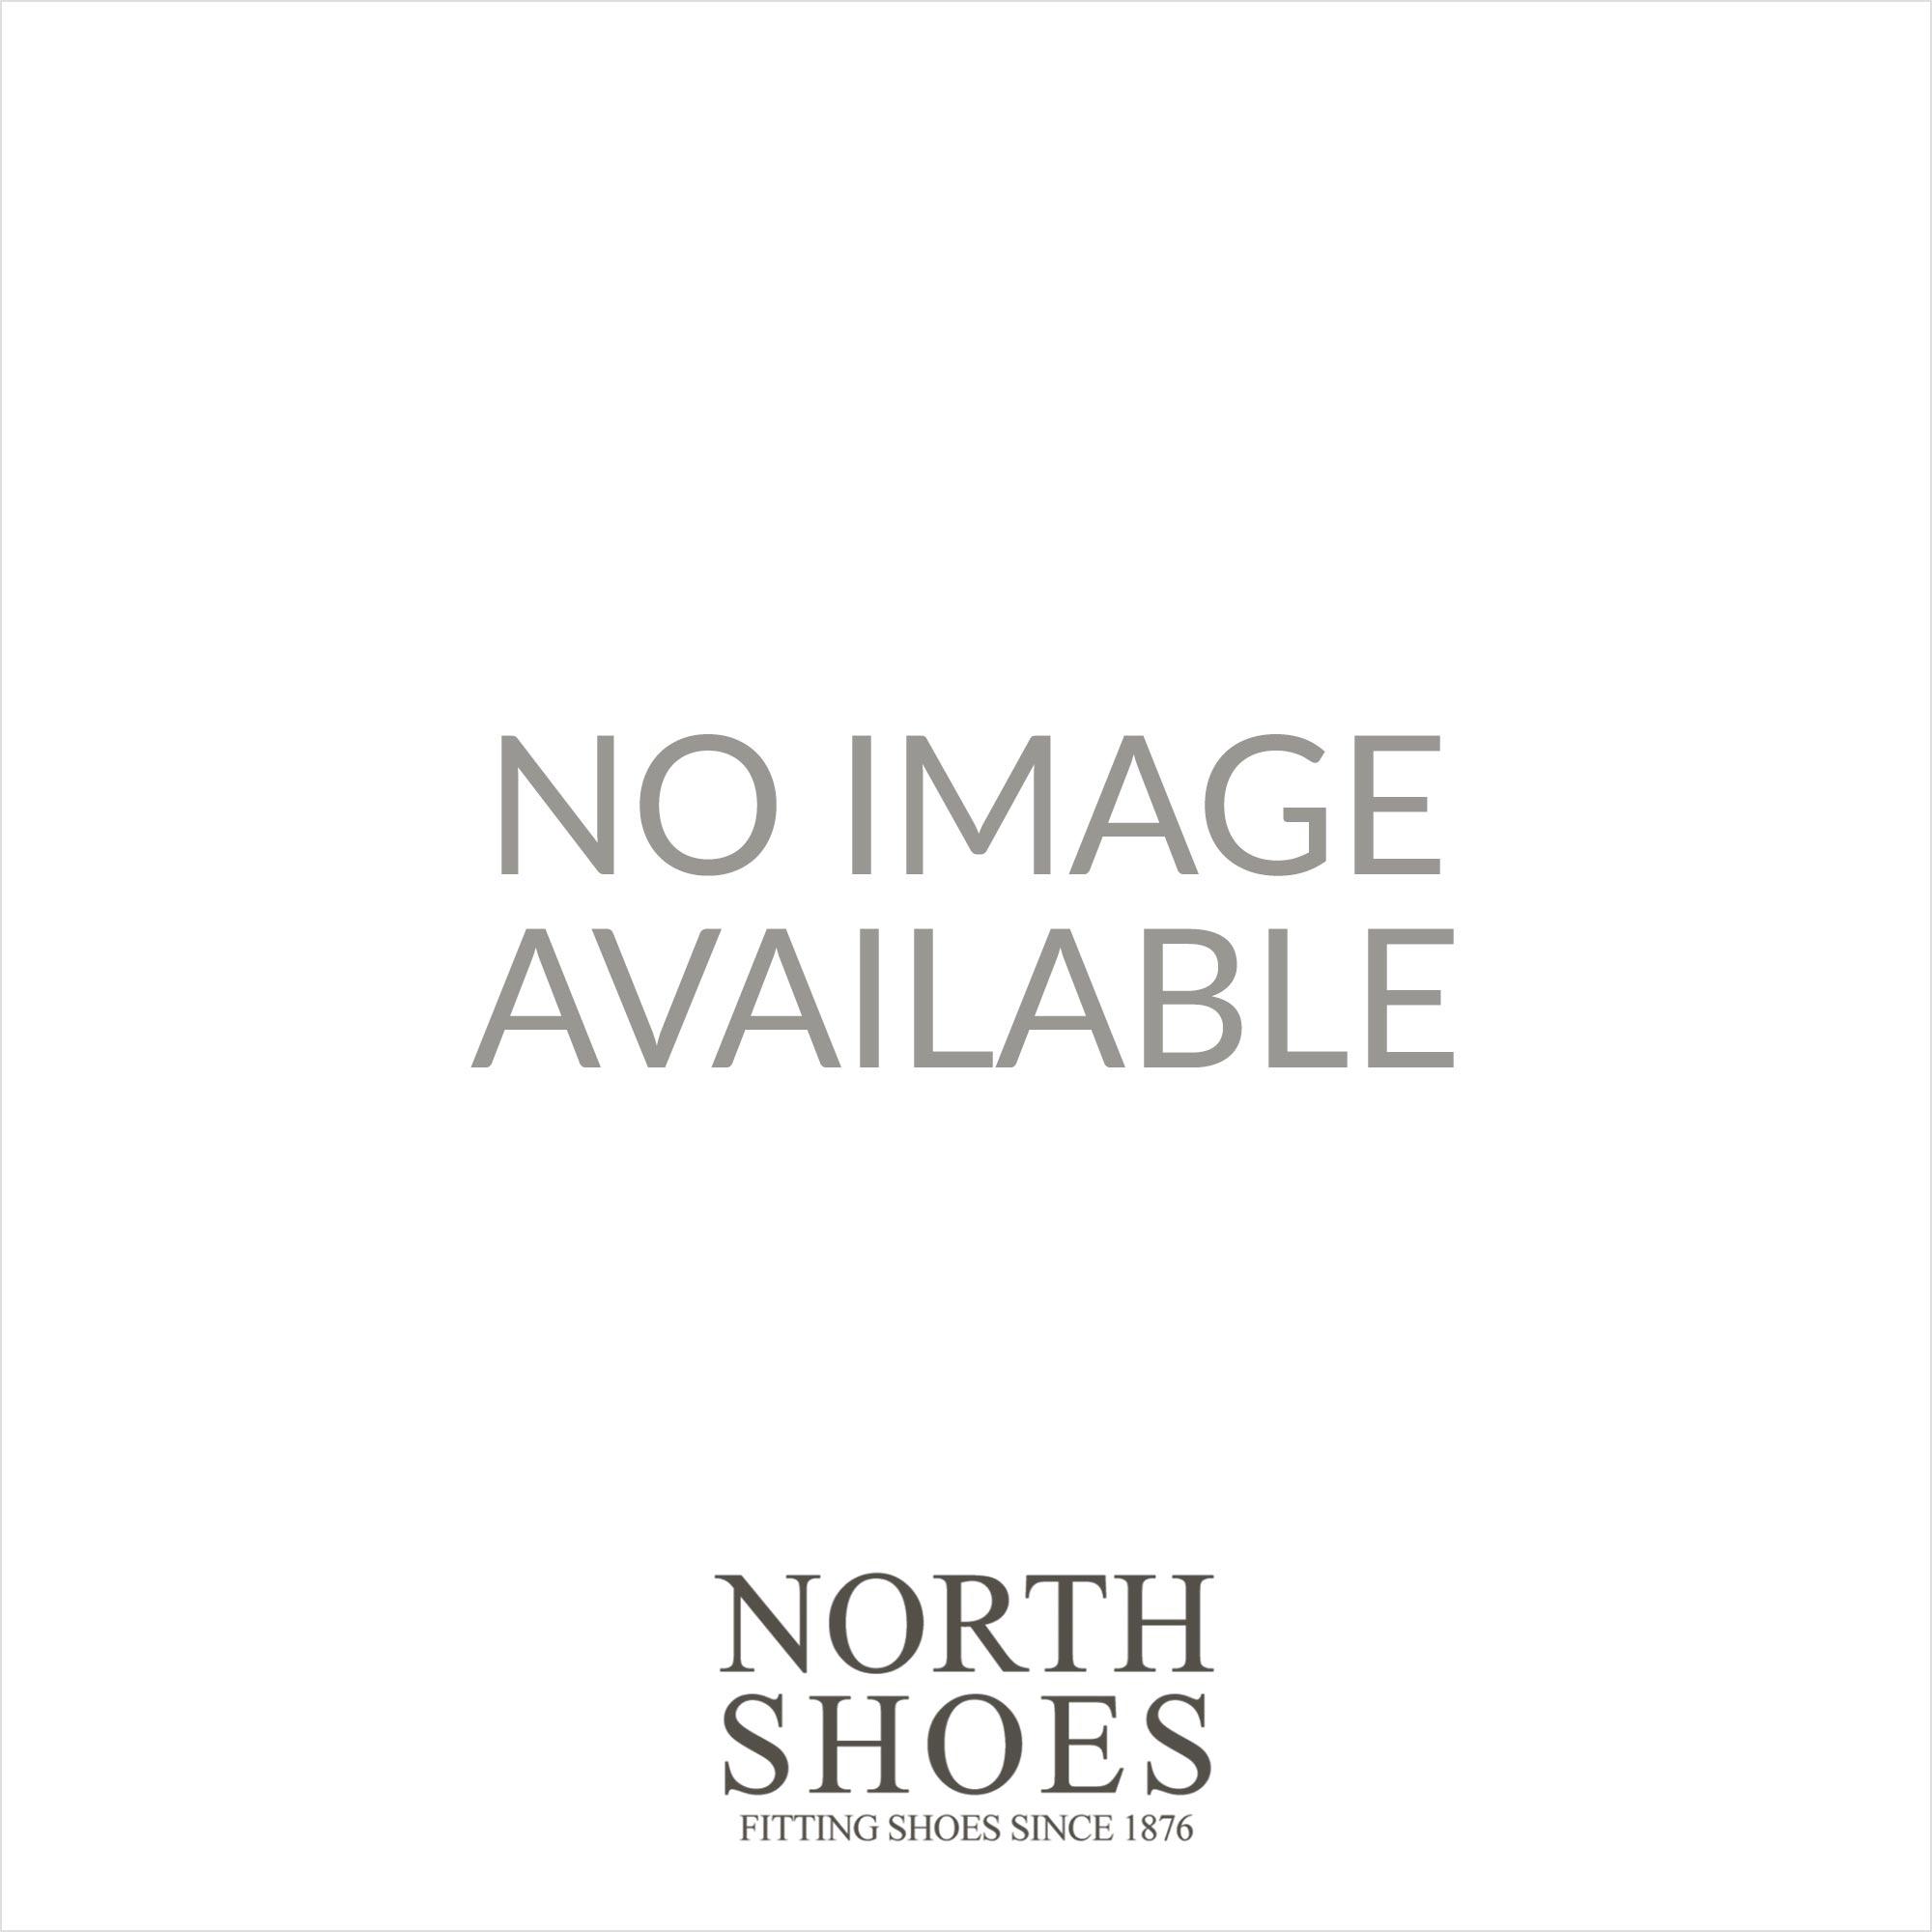 779ea6c7d4c8 Rieker 59090-00 Black Nubuck Leather Womens Heeled Chelsea Boots ...